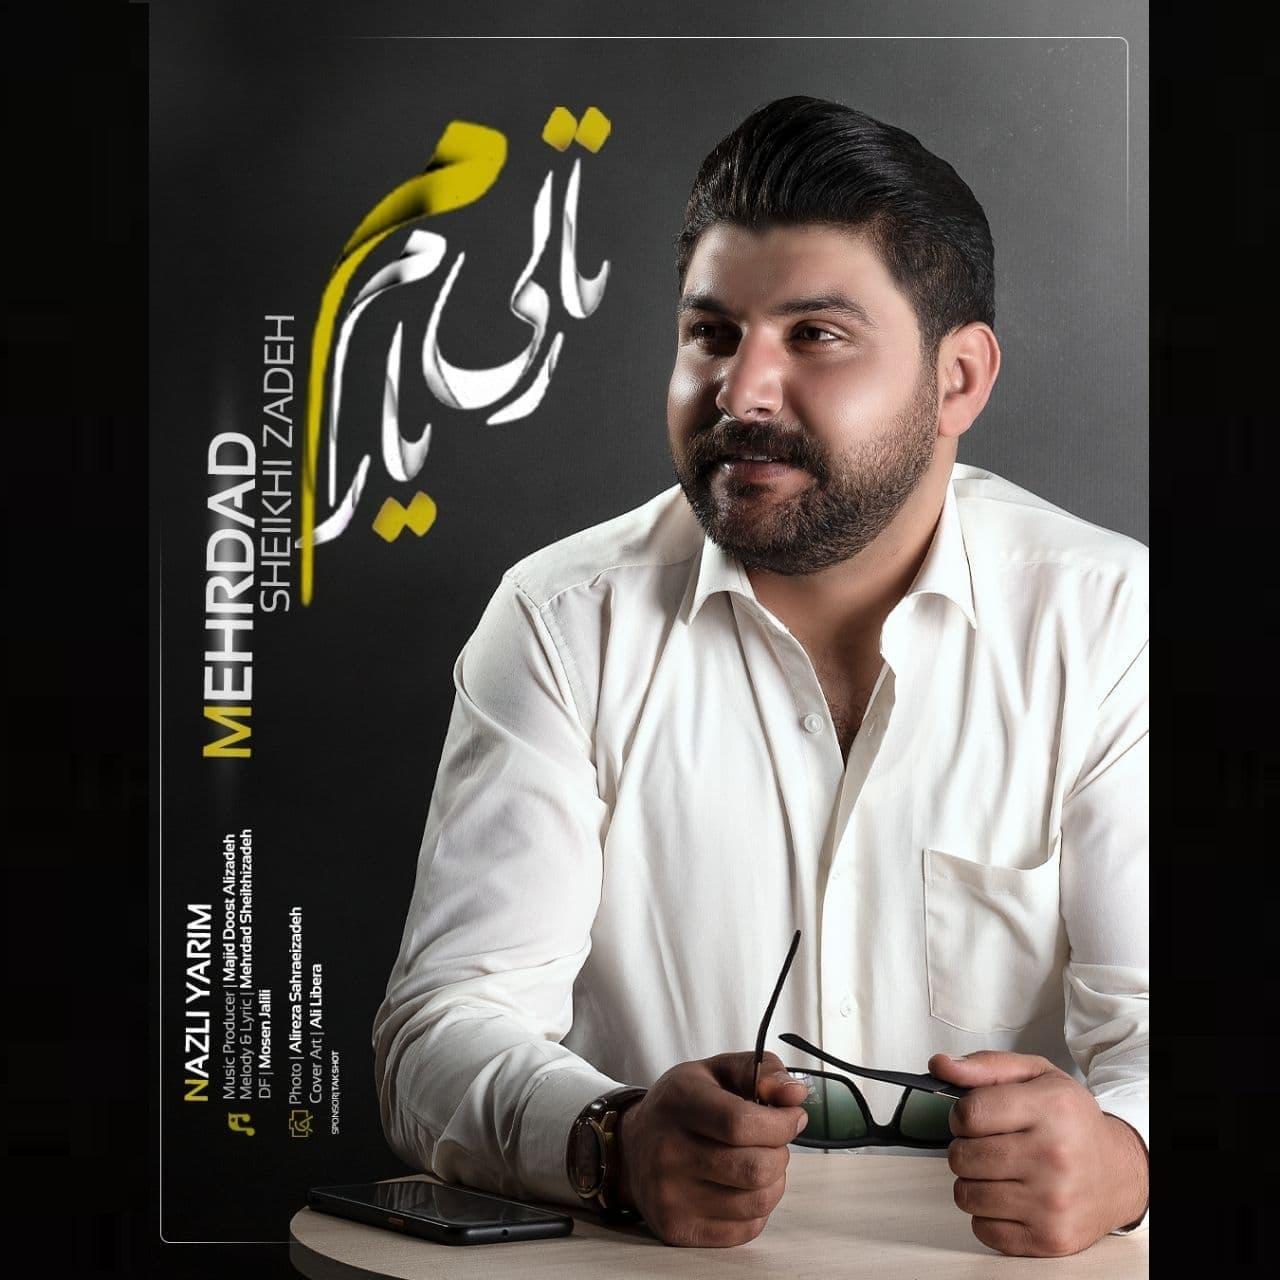 https://s16.picofile.com/file/8428743868/09Mehrdad_Sheikhi_Zadeh_Nazli_Yarim.jpg